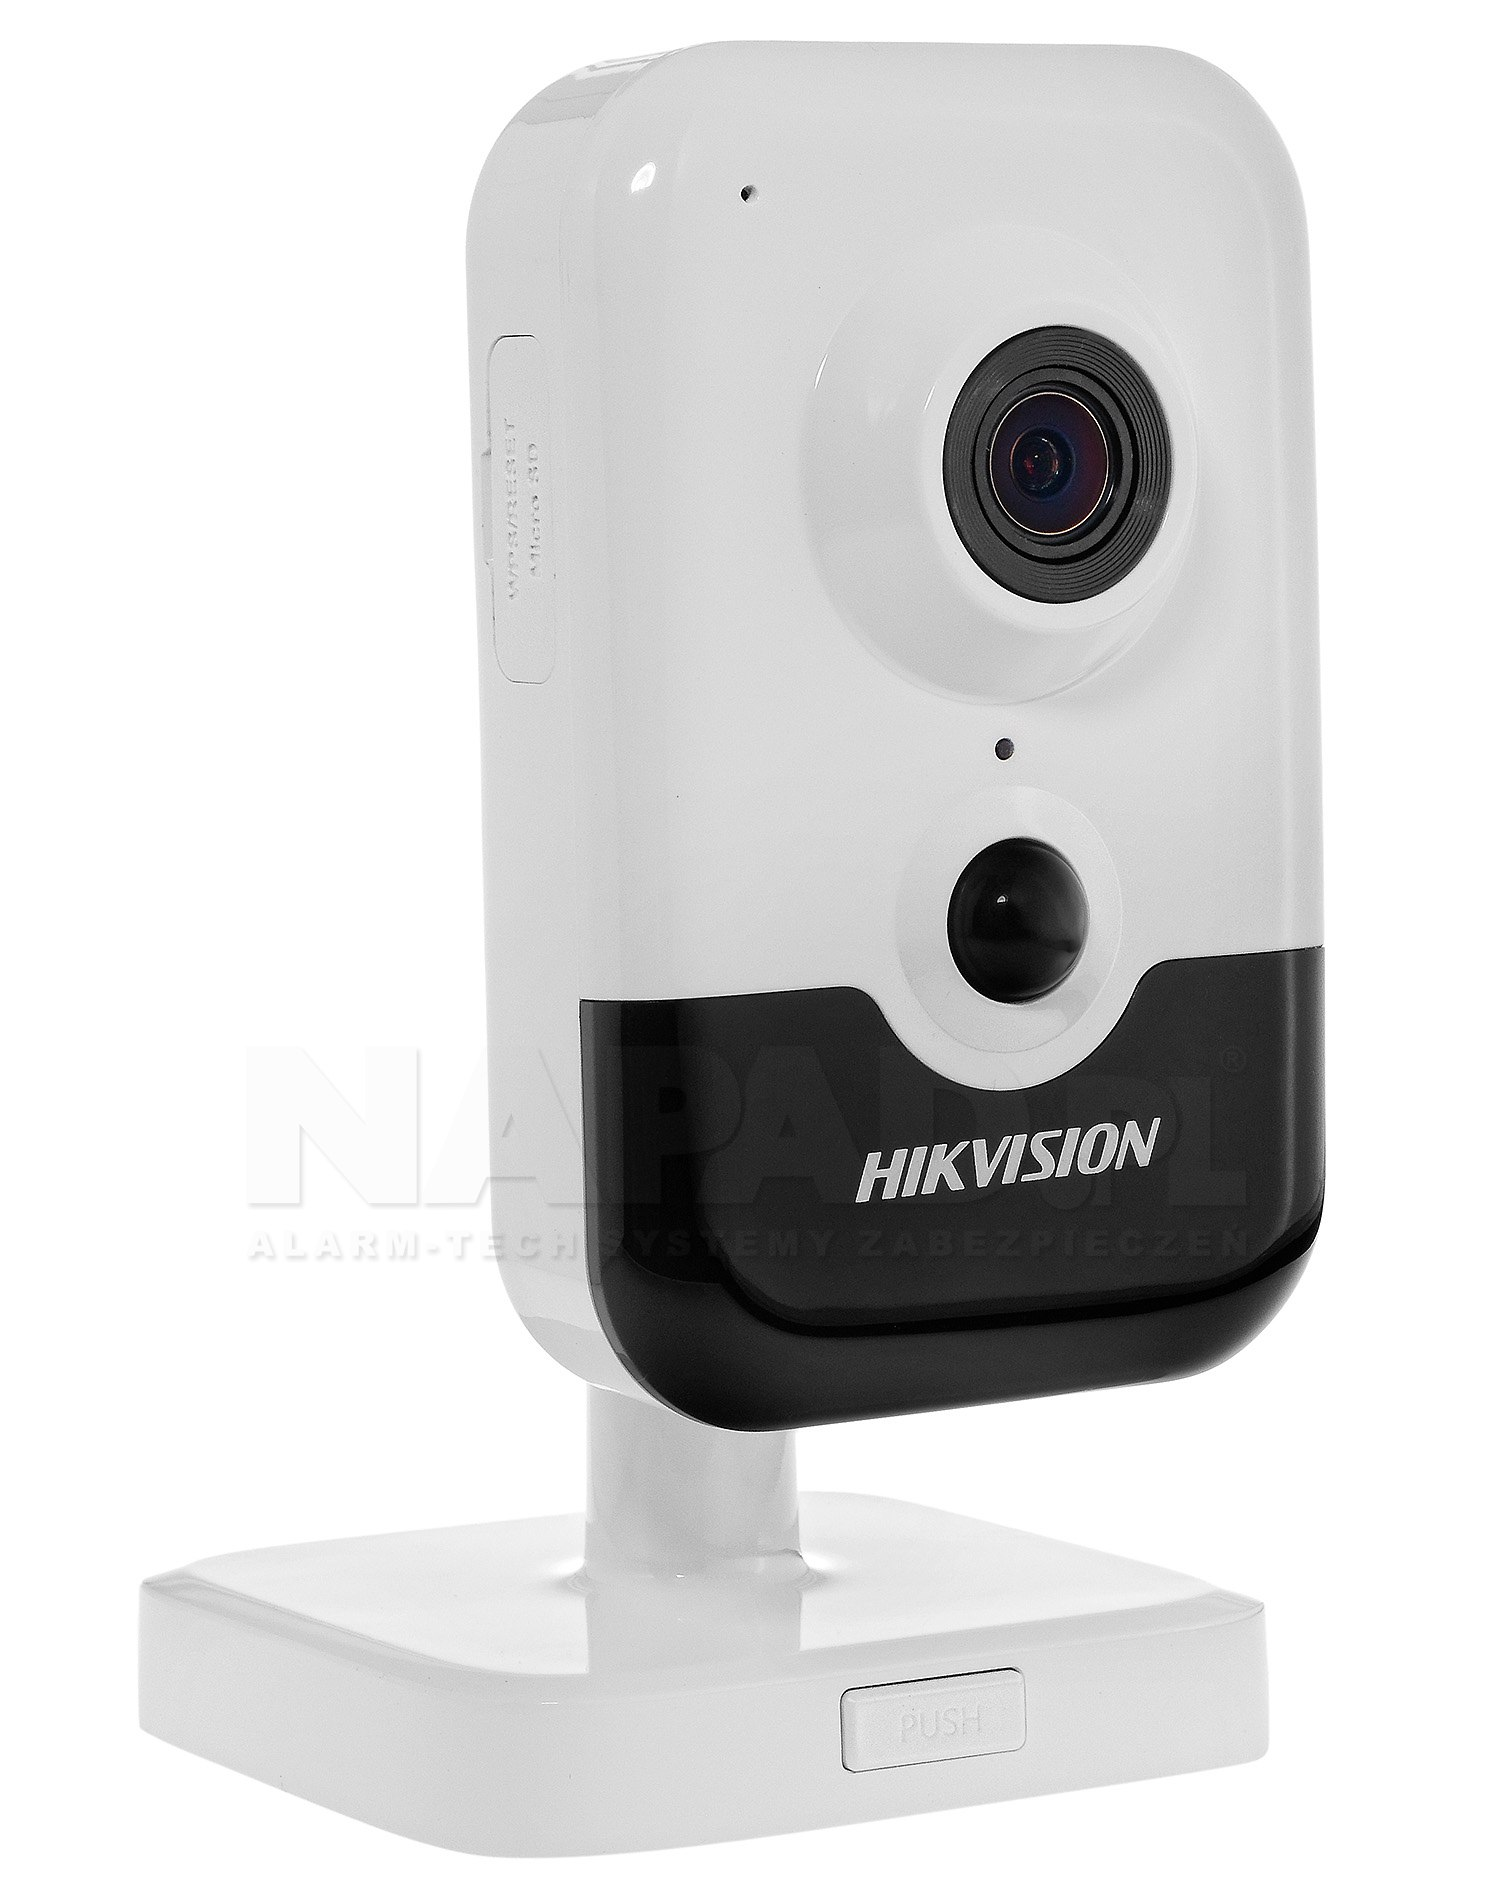 Kamera IP 2Mpx DS-2CD2423G0-IW